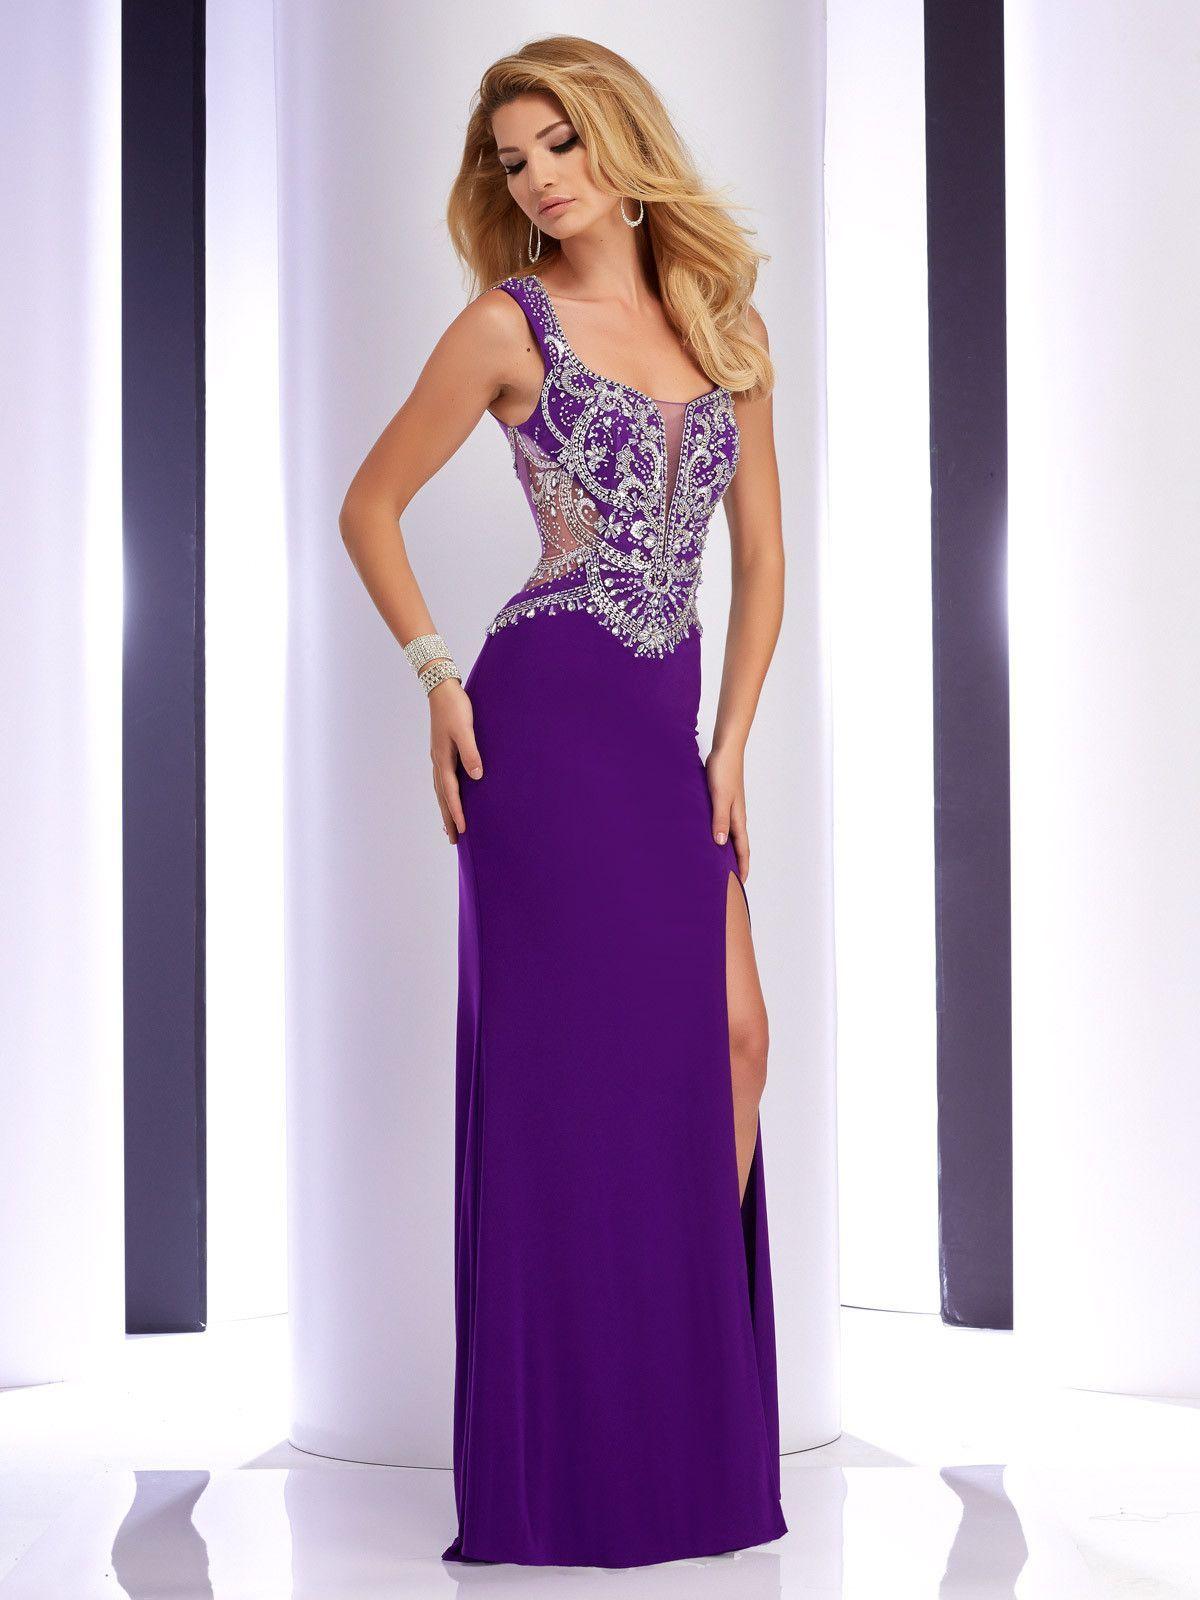 Clarisse 2808 Purple   BUY NOW!   Pinterest   Vestidos de noche ...